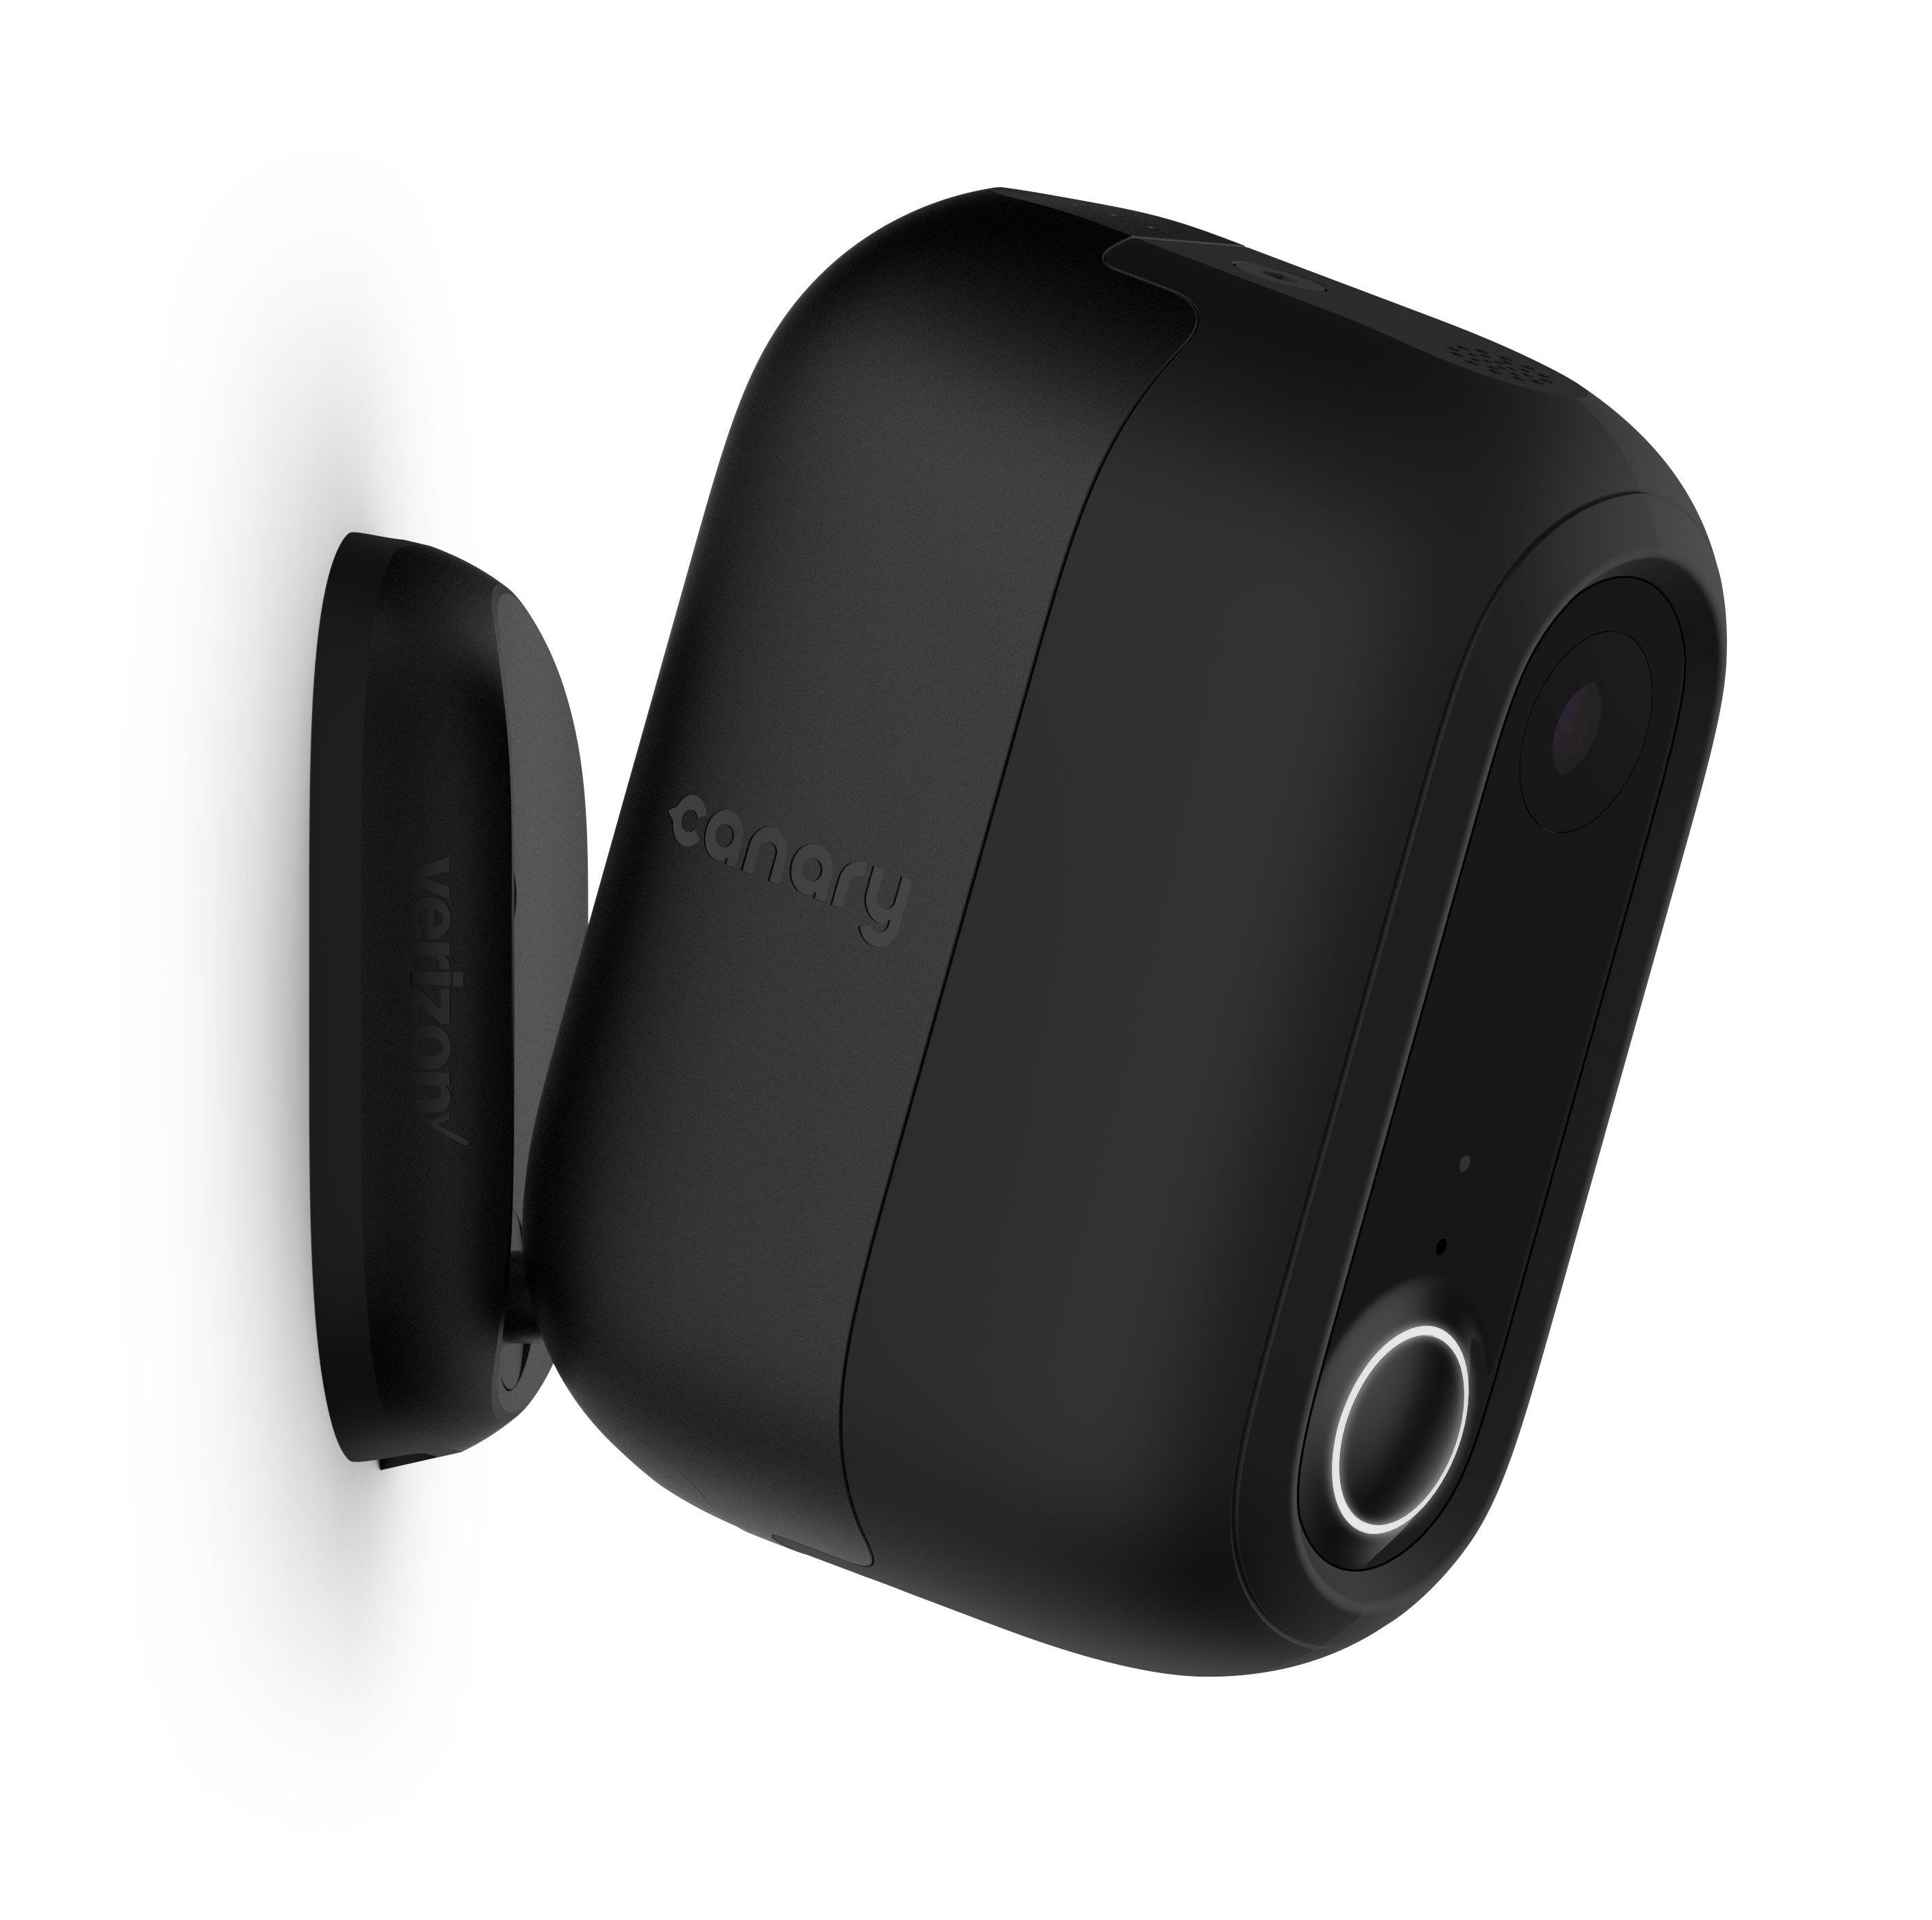 Canary Ip Camera Black Plastic Matte Product